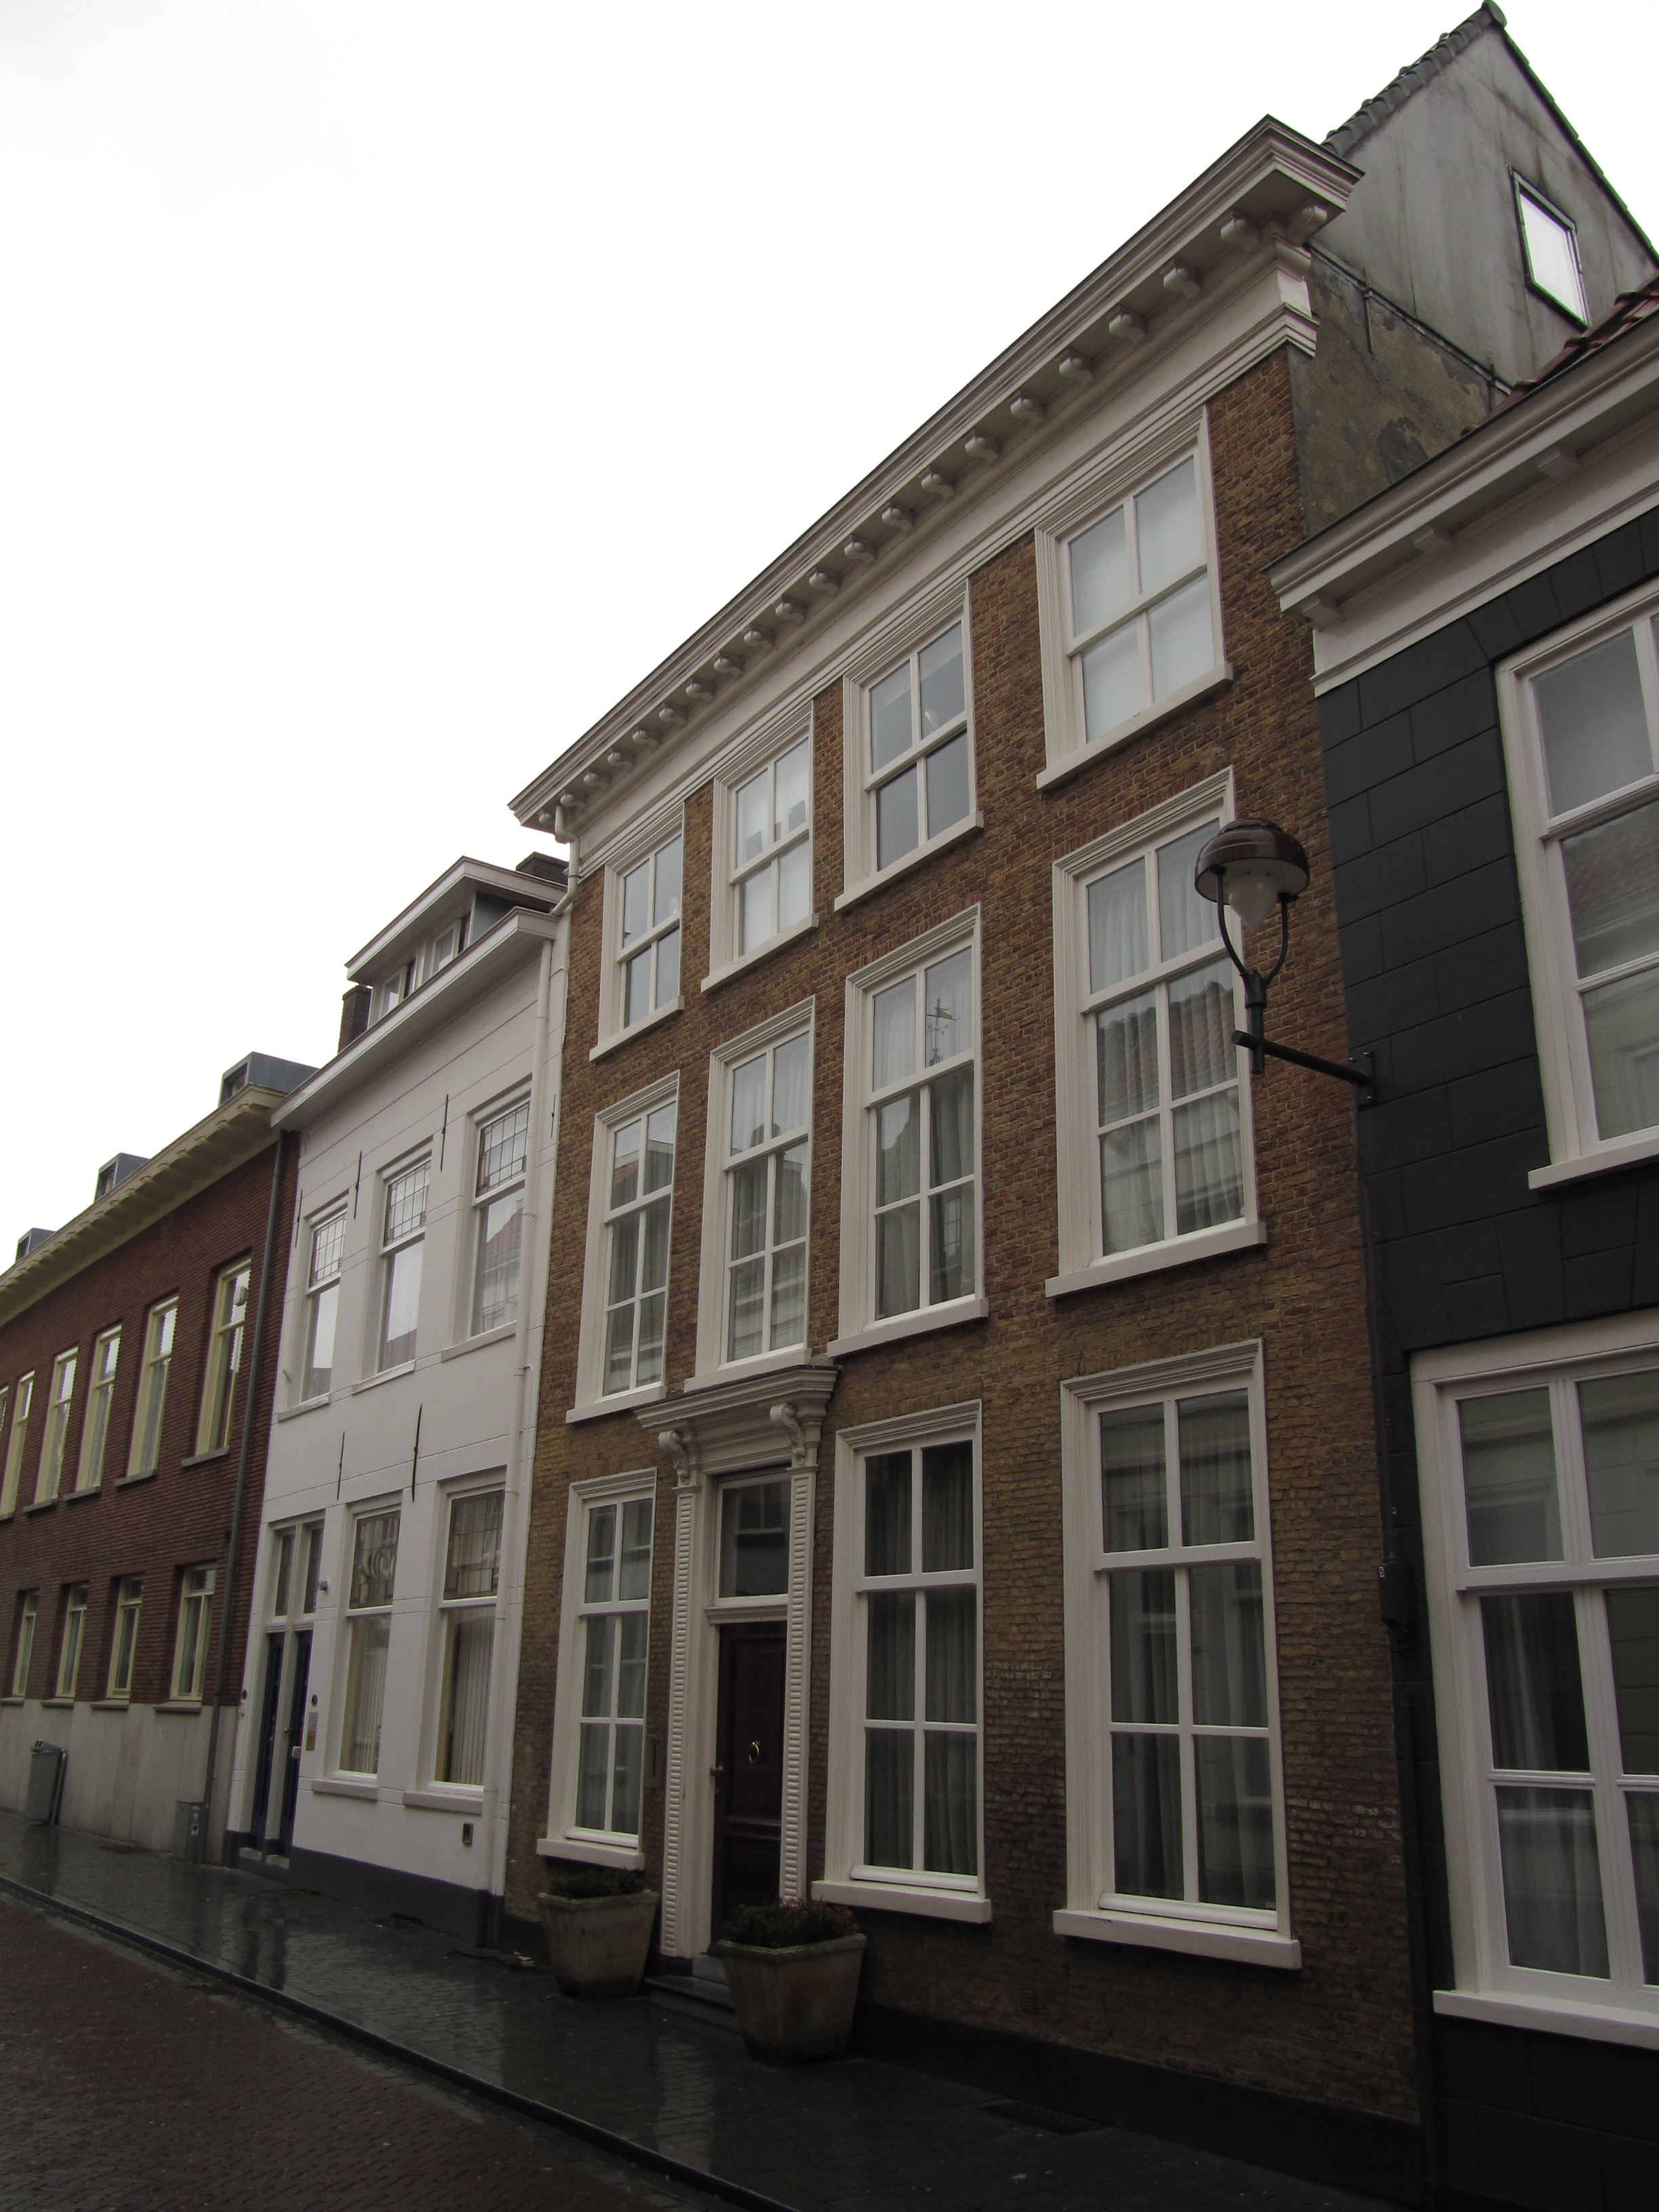 Huis met ontpleisterde lijstgevel en met pilasters en kroonlijst versierde ingang in bergen op - Huis ingang ...